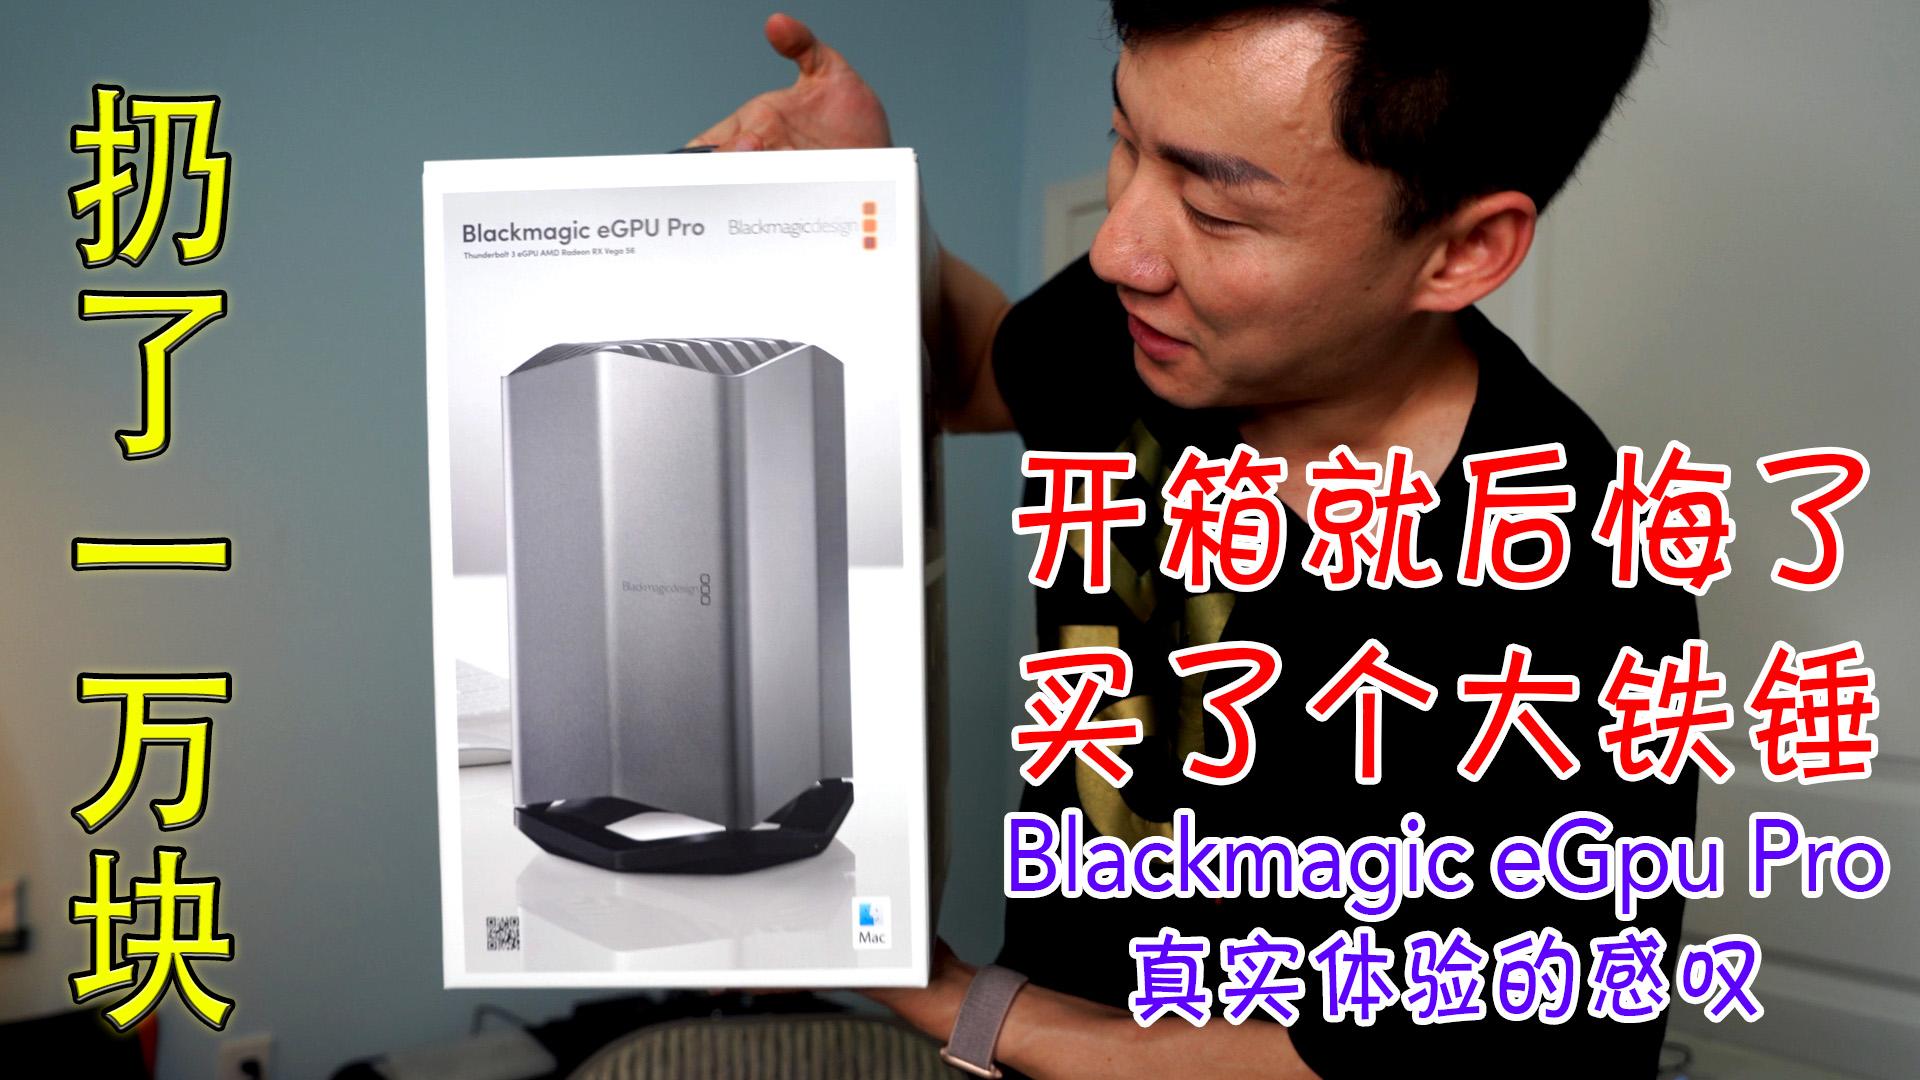 Blackmagic eGpu Pro 开箱体验!